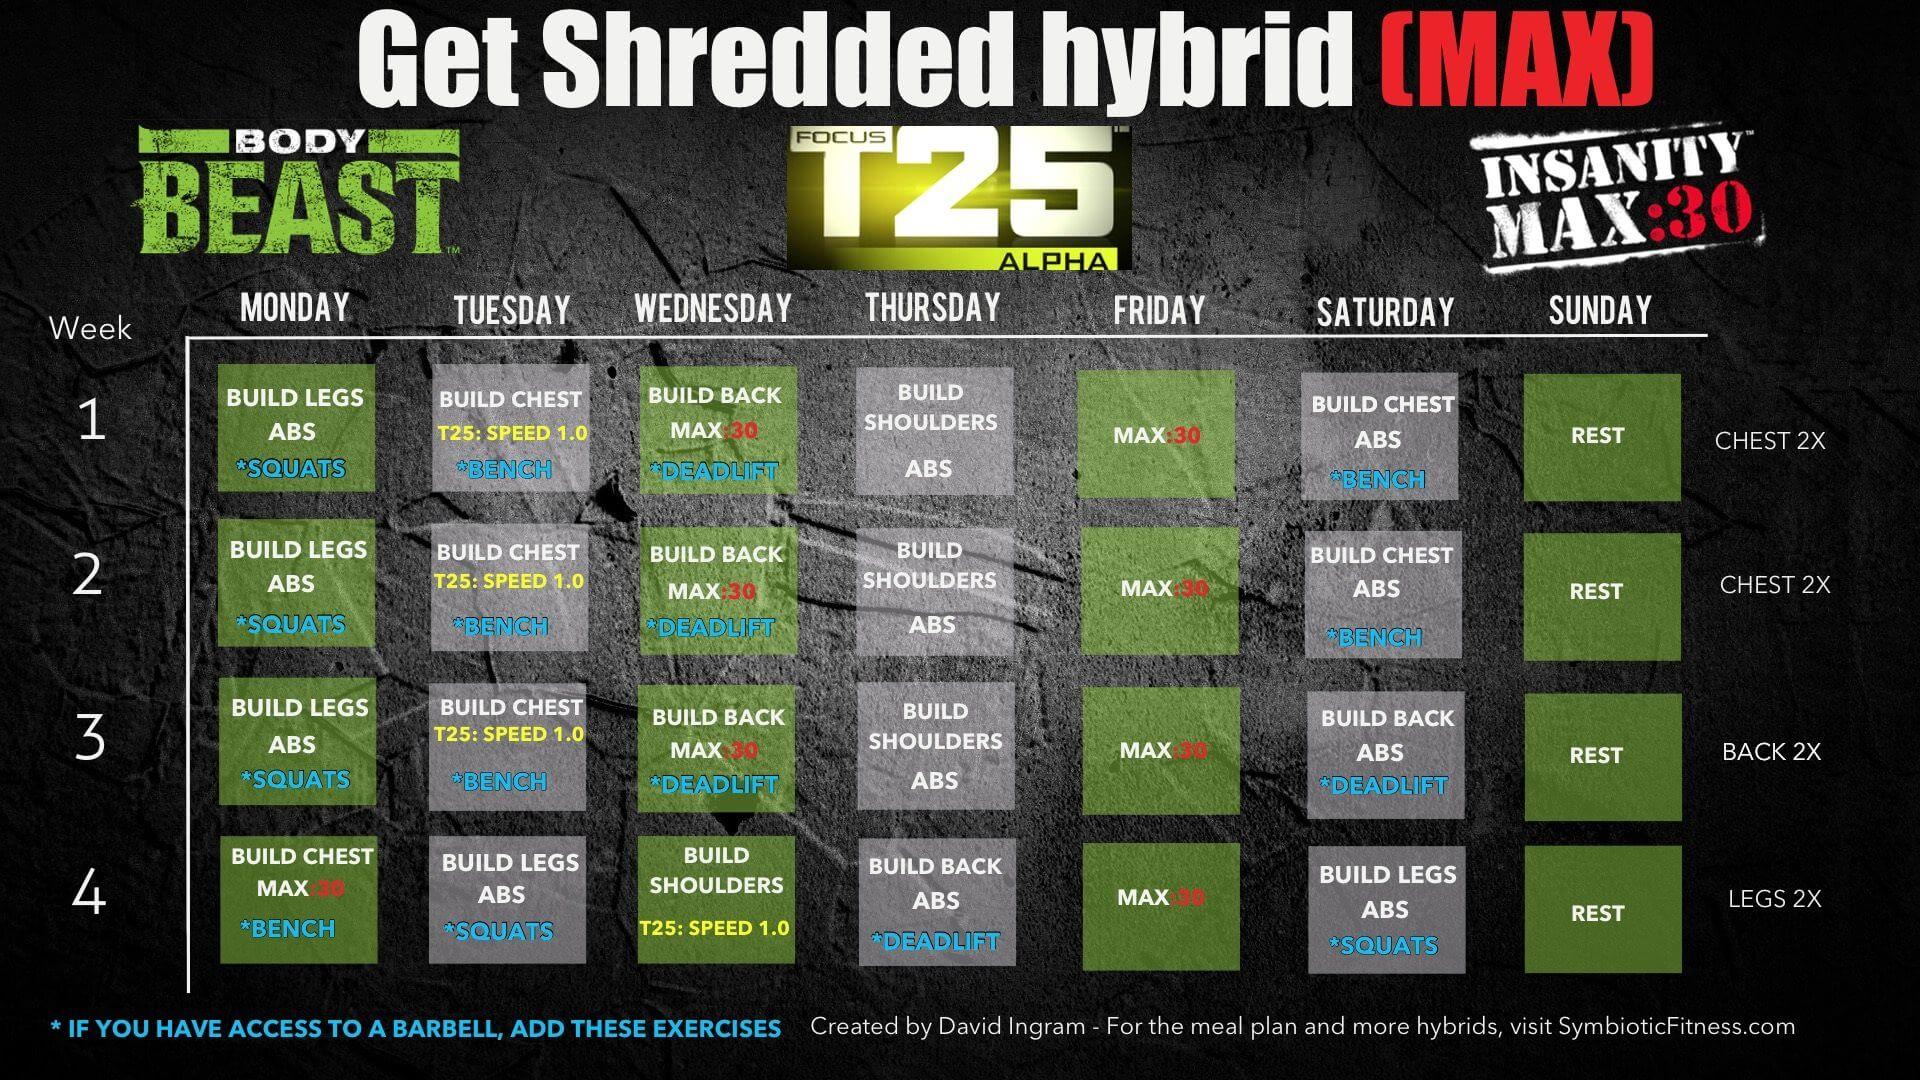 Body Beast Max 30 Hybrid | Calendar For Planning with regard to Insanity Max 30 Hybrid Calendar